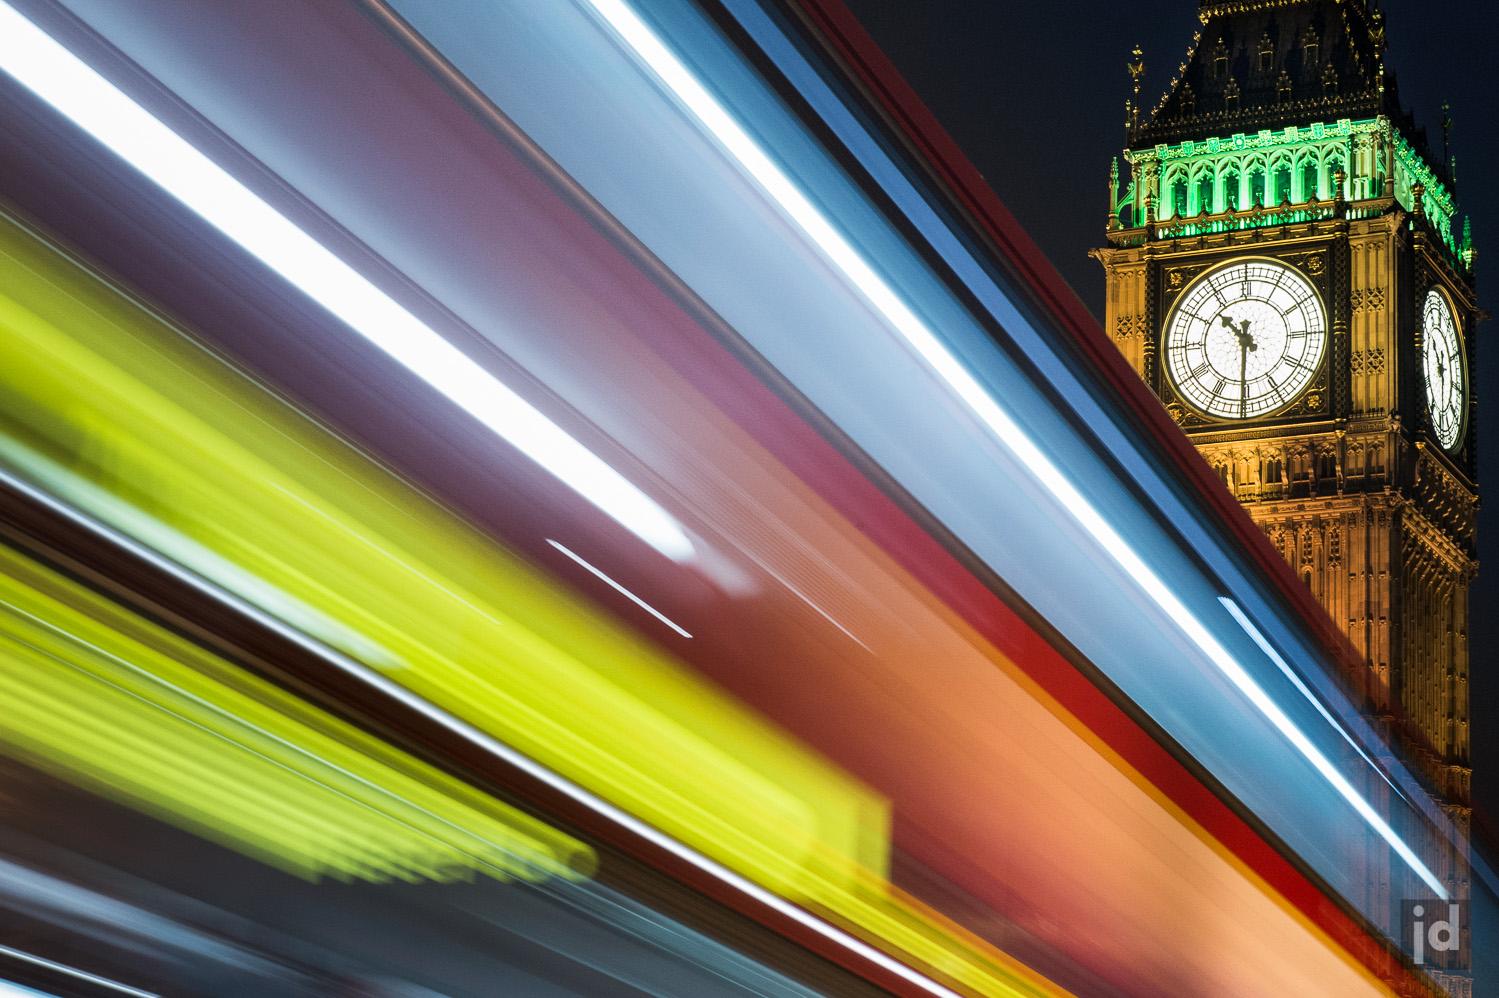 London_Photography_Jason_Davis_Images_025.jpg